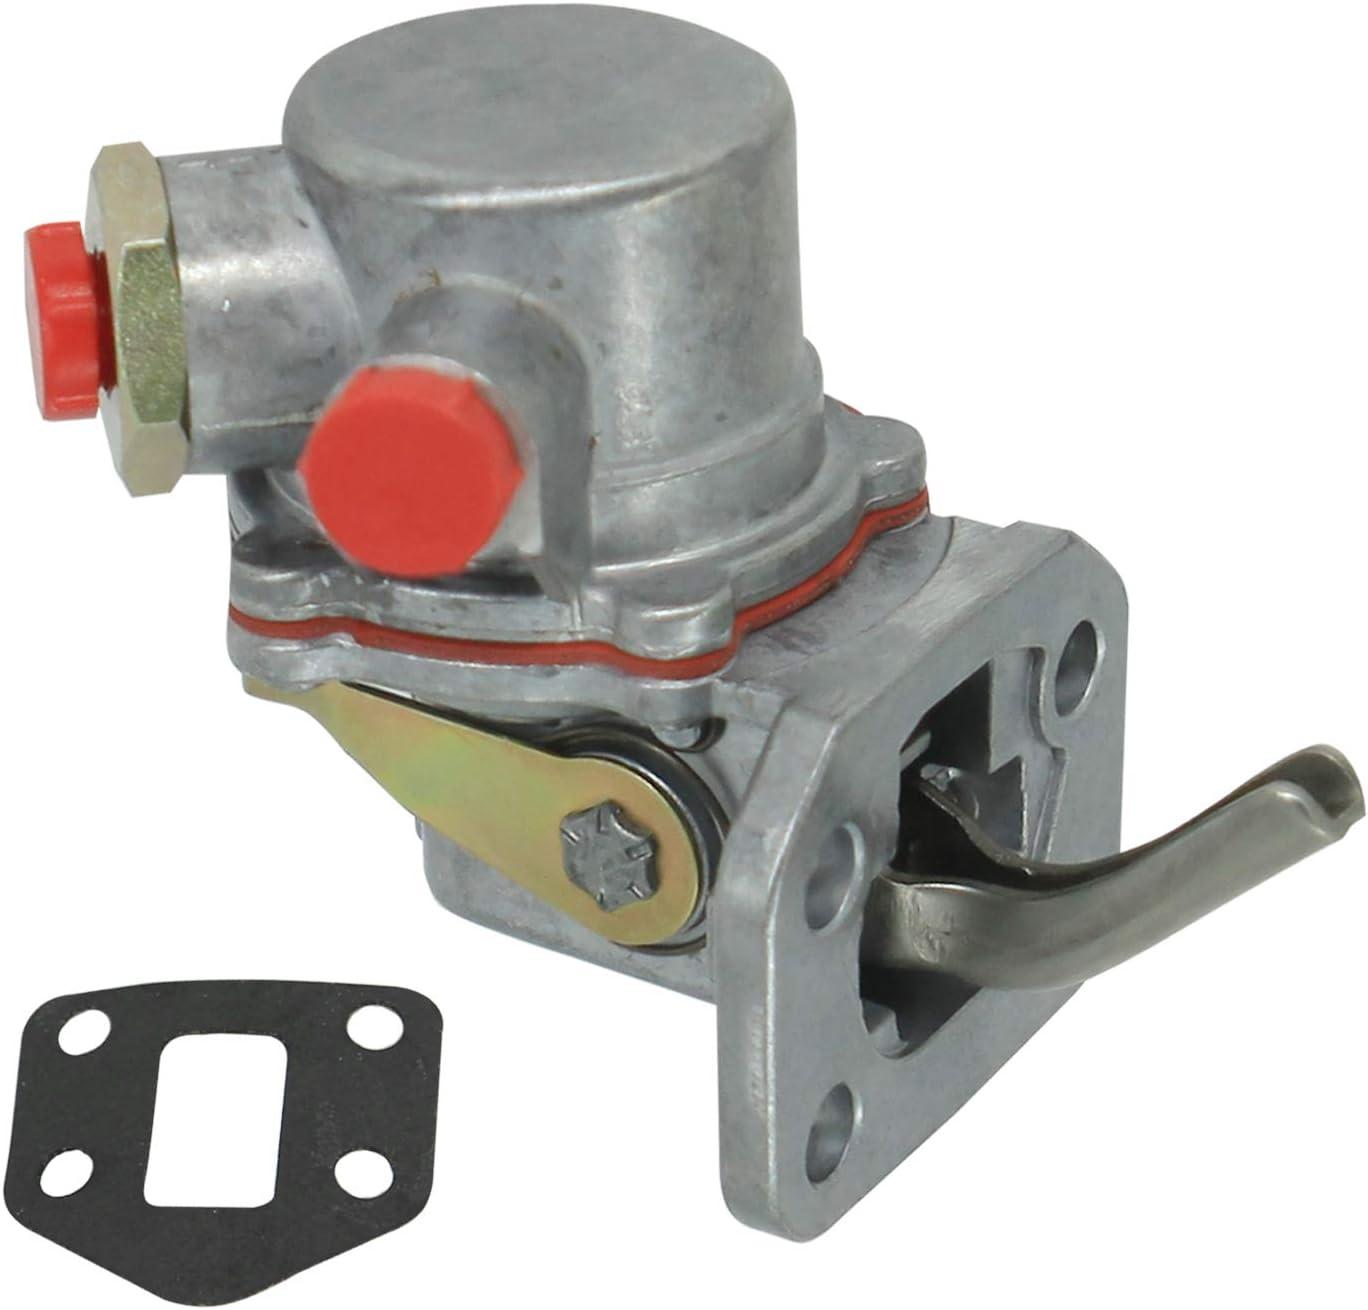 Fuel Pump ULPK0034 4224451M91 3637322M91 Fit For Perkins Perkins 1000 Series 1004.4 HFP664 Engine 1004-4 1004-4T 1004G 1004-40 JCB Backhoe Loader 2CX 210 212 3CX 4CX 5CX 214 217 216 1400B